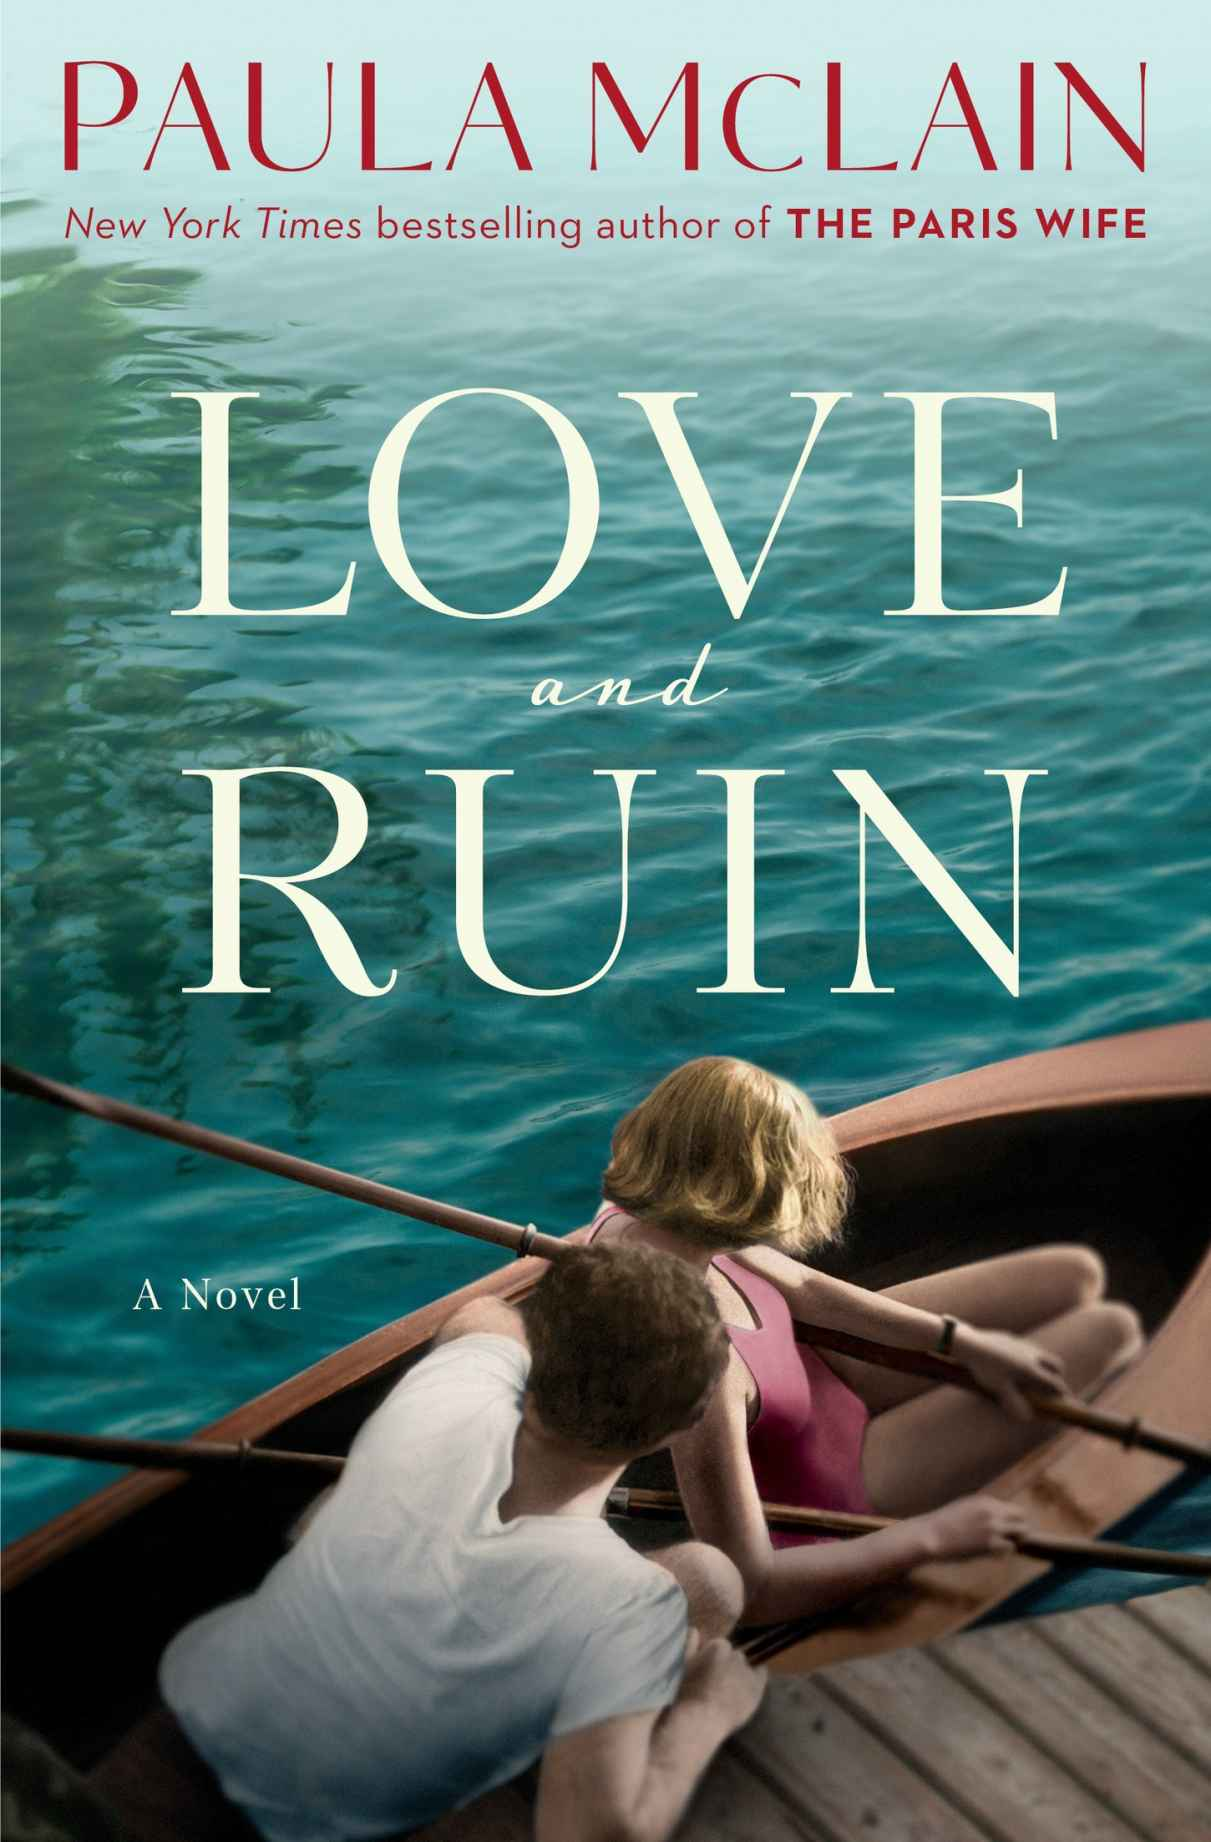 Love and Ruin: A Novel - Paula McLain [kindle] [mobi]